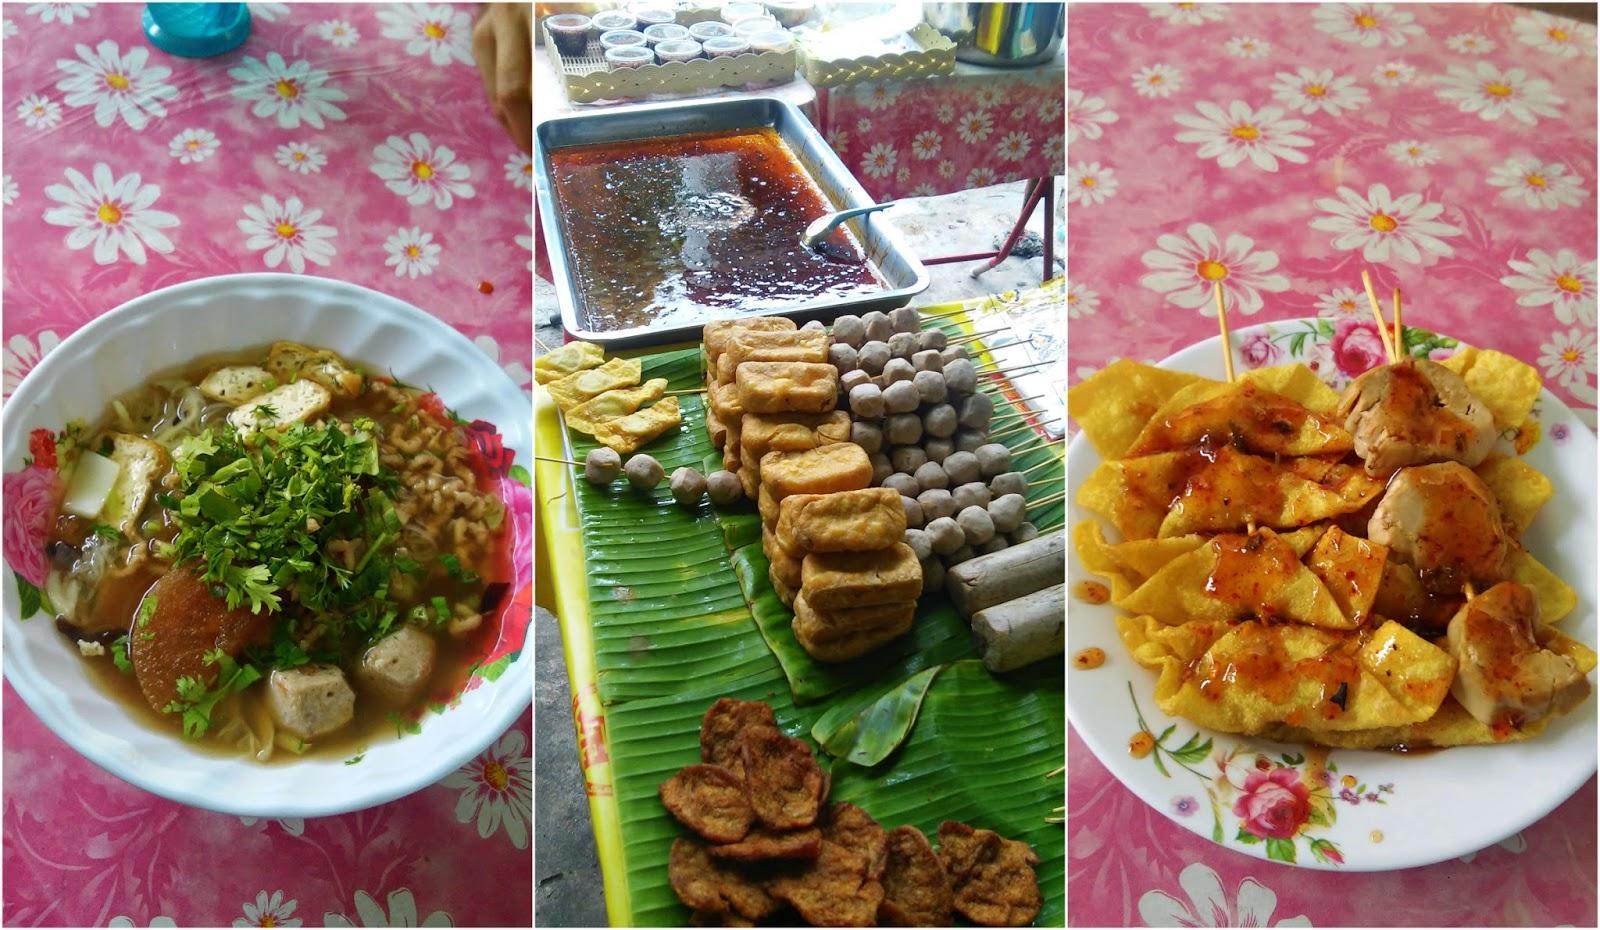 Vegan mock meats Chiang Mai, Thailand